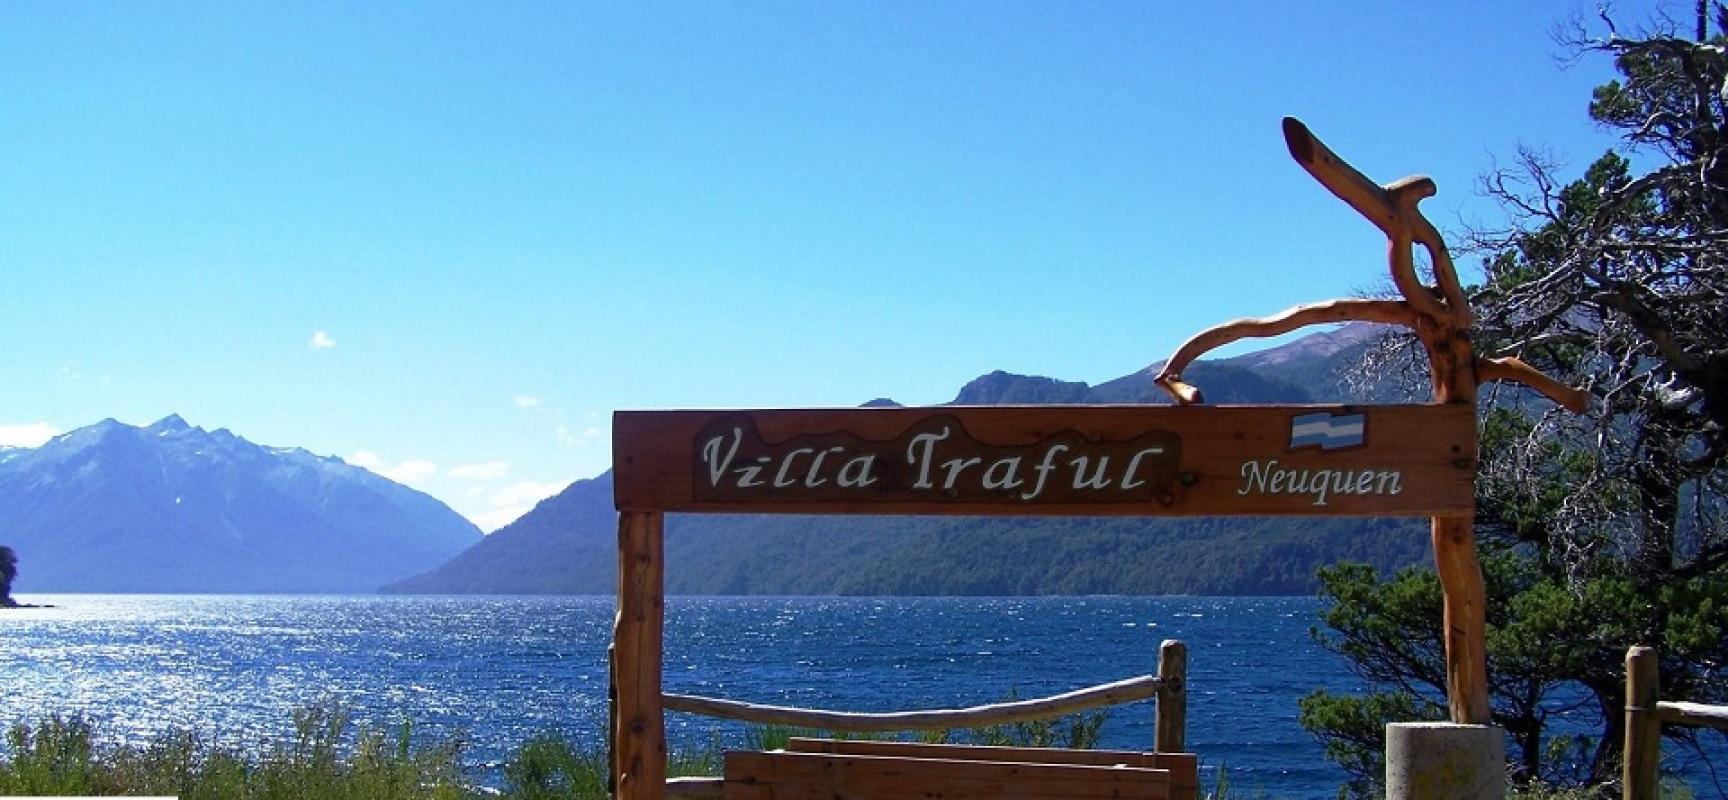 Circuito Grande : Circuito grande gurutravel patagonia